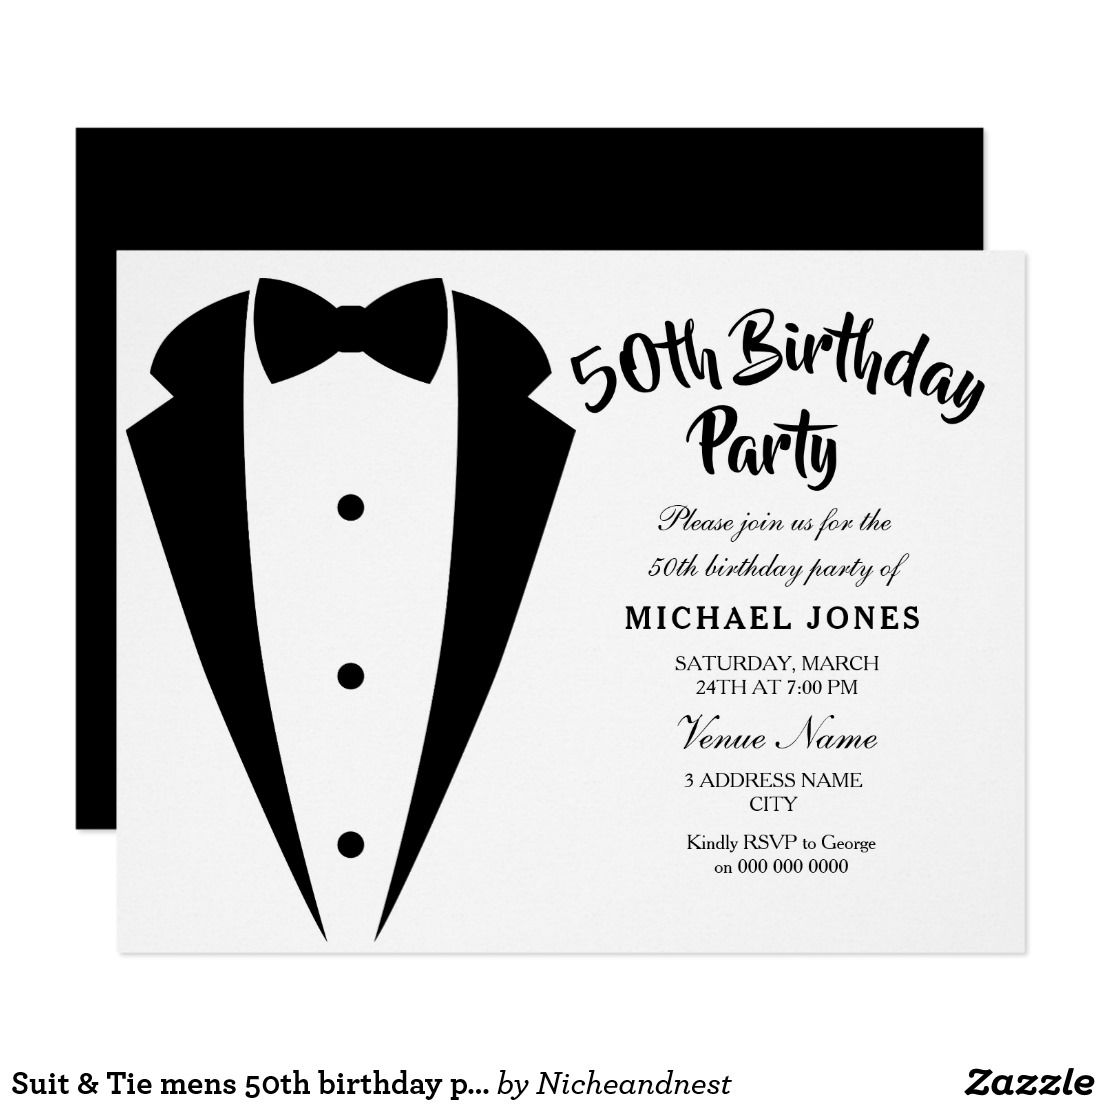 Suit & Tie mens 50th birthday party invitation Suit & Tie mens 50th ...